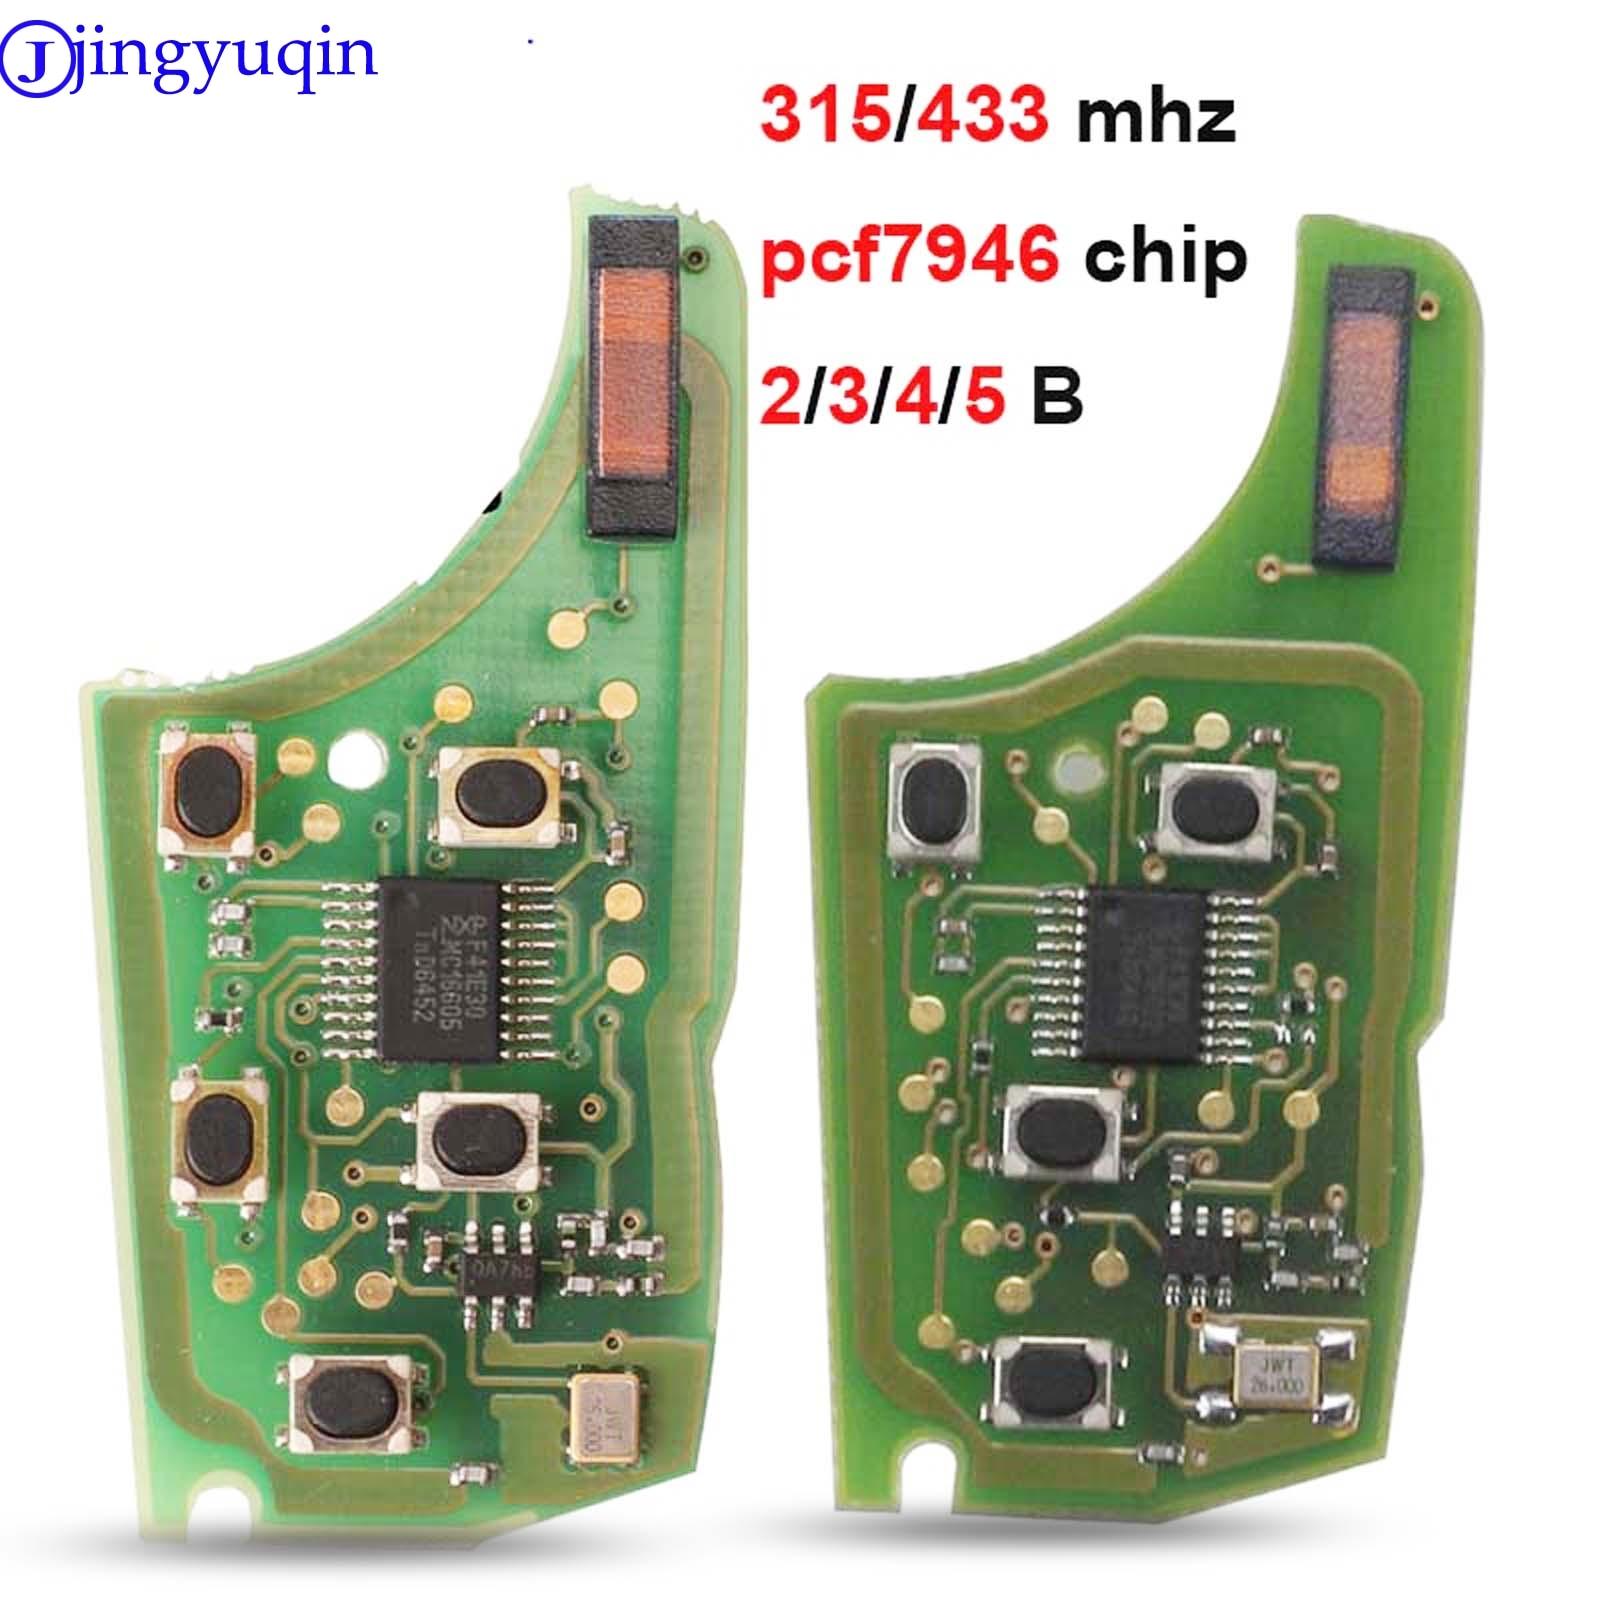 Jingyuqin 315/434 МГц 10p Автомобильная сигнализация дистанционный ключ печатная плата электронная для Chevrolet Malibu Cruze Aveo Spark Sail 2/3/4/5 кнопка